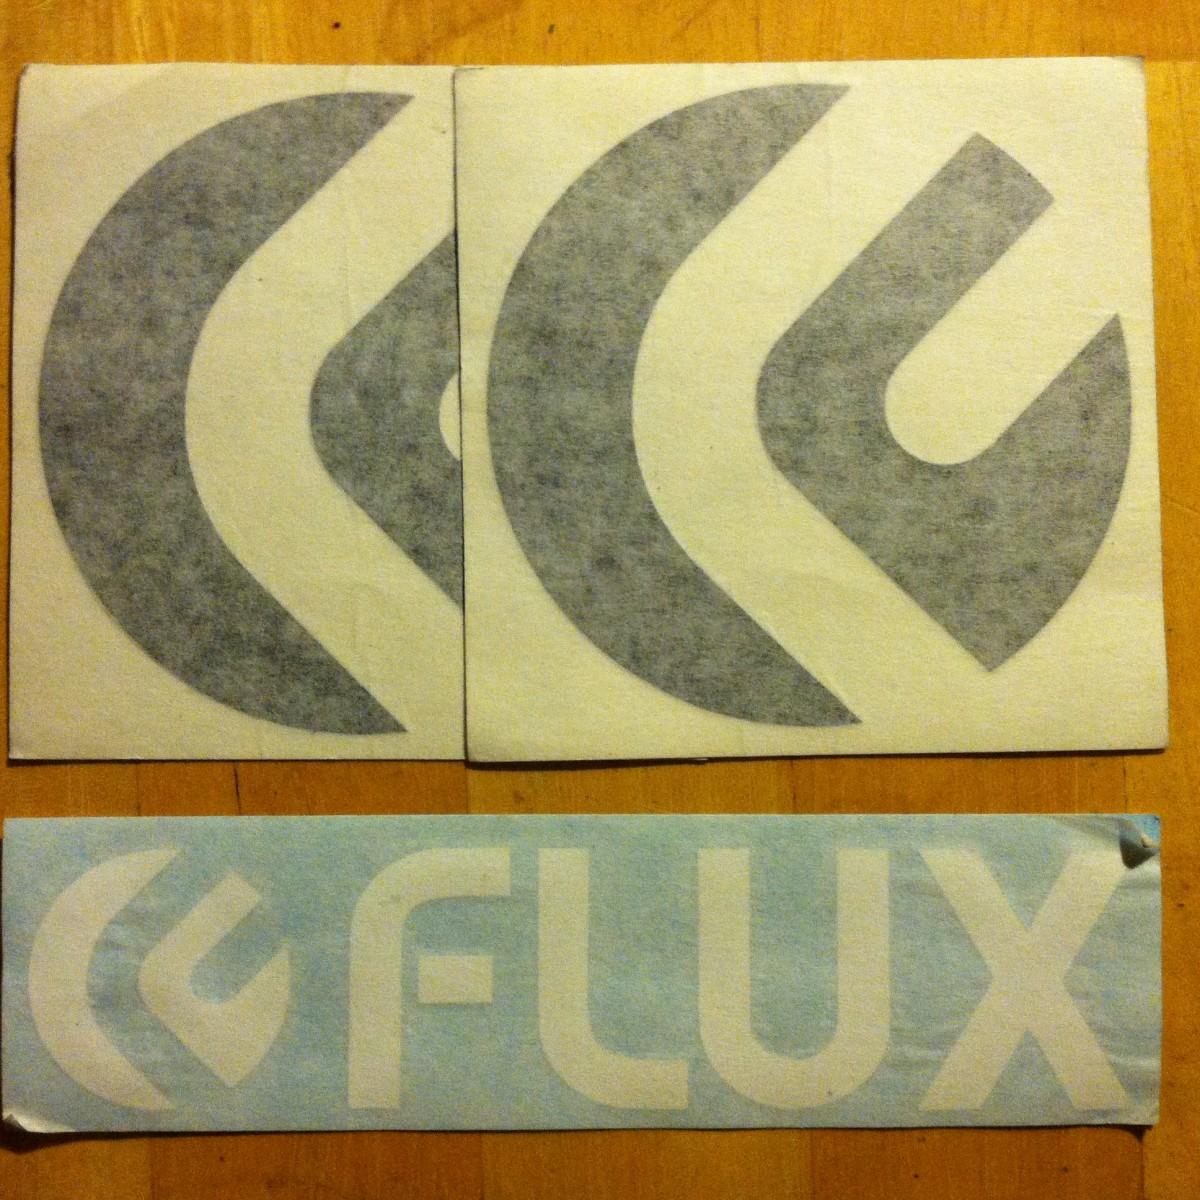 free-skate-stickers